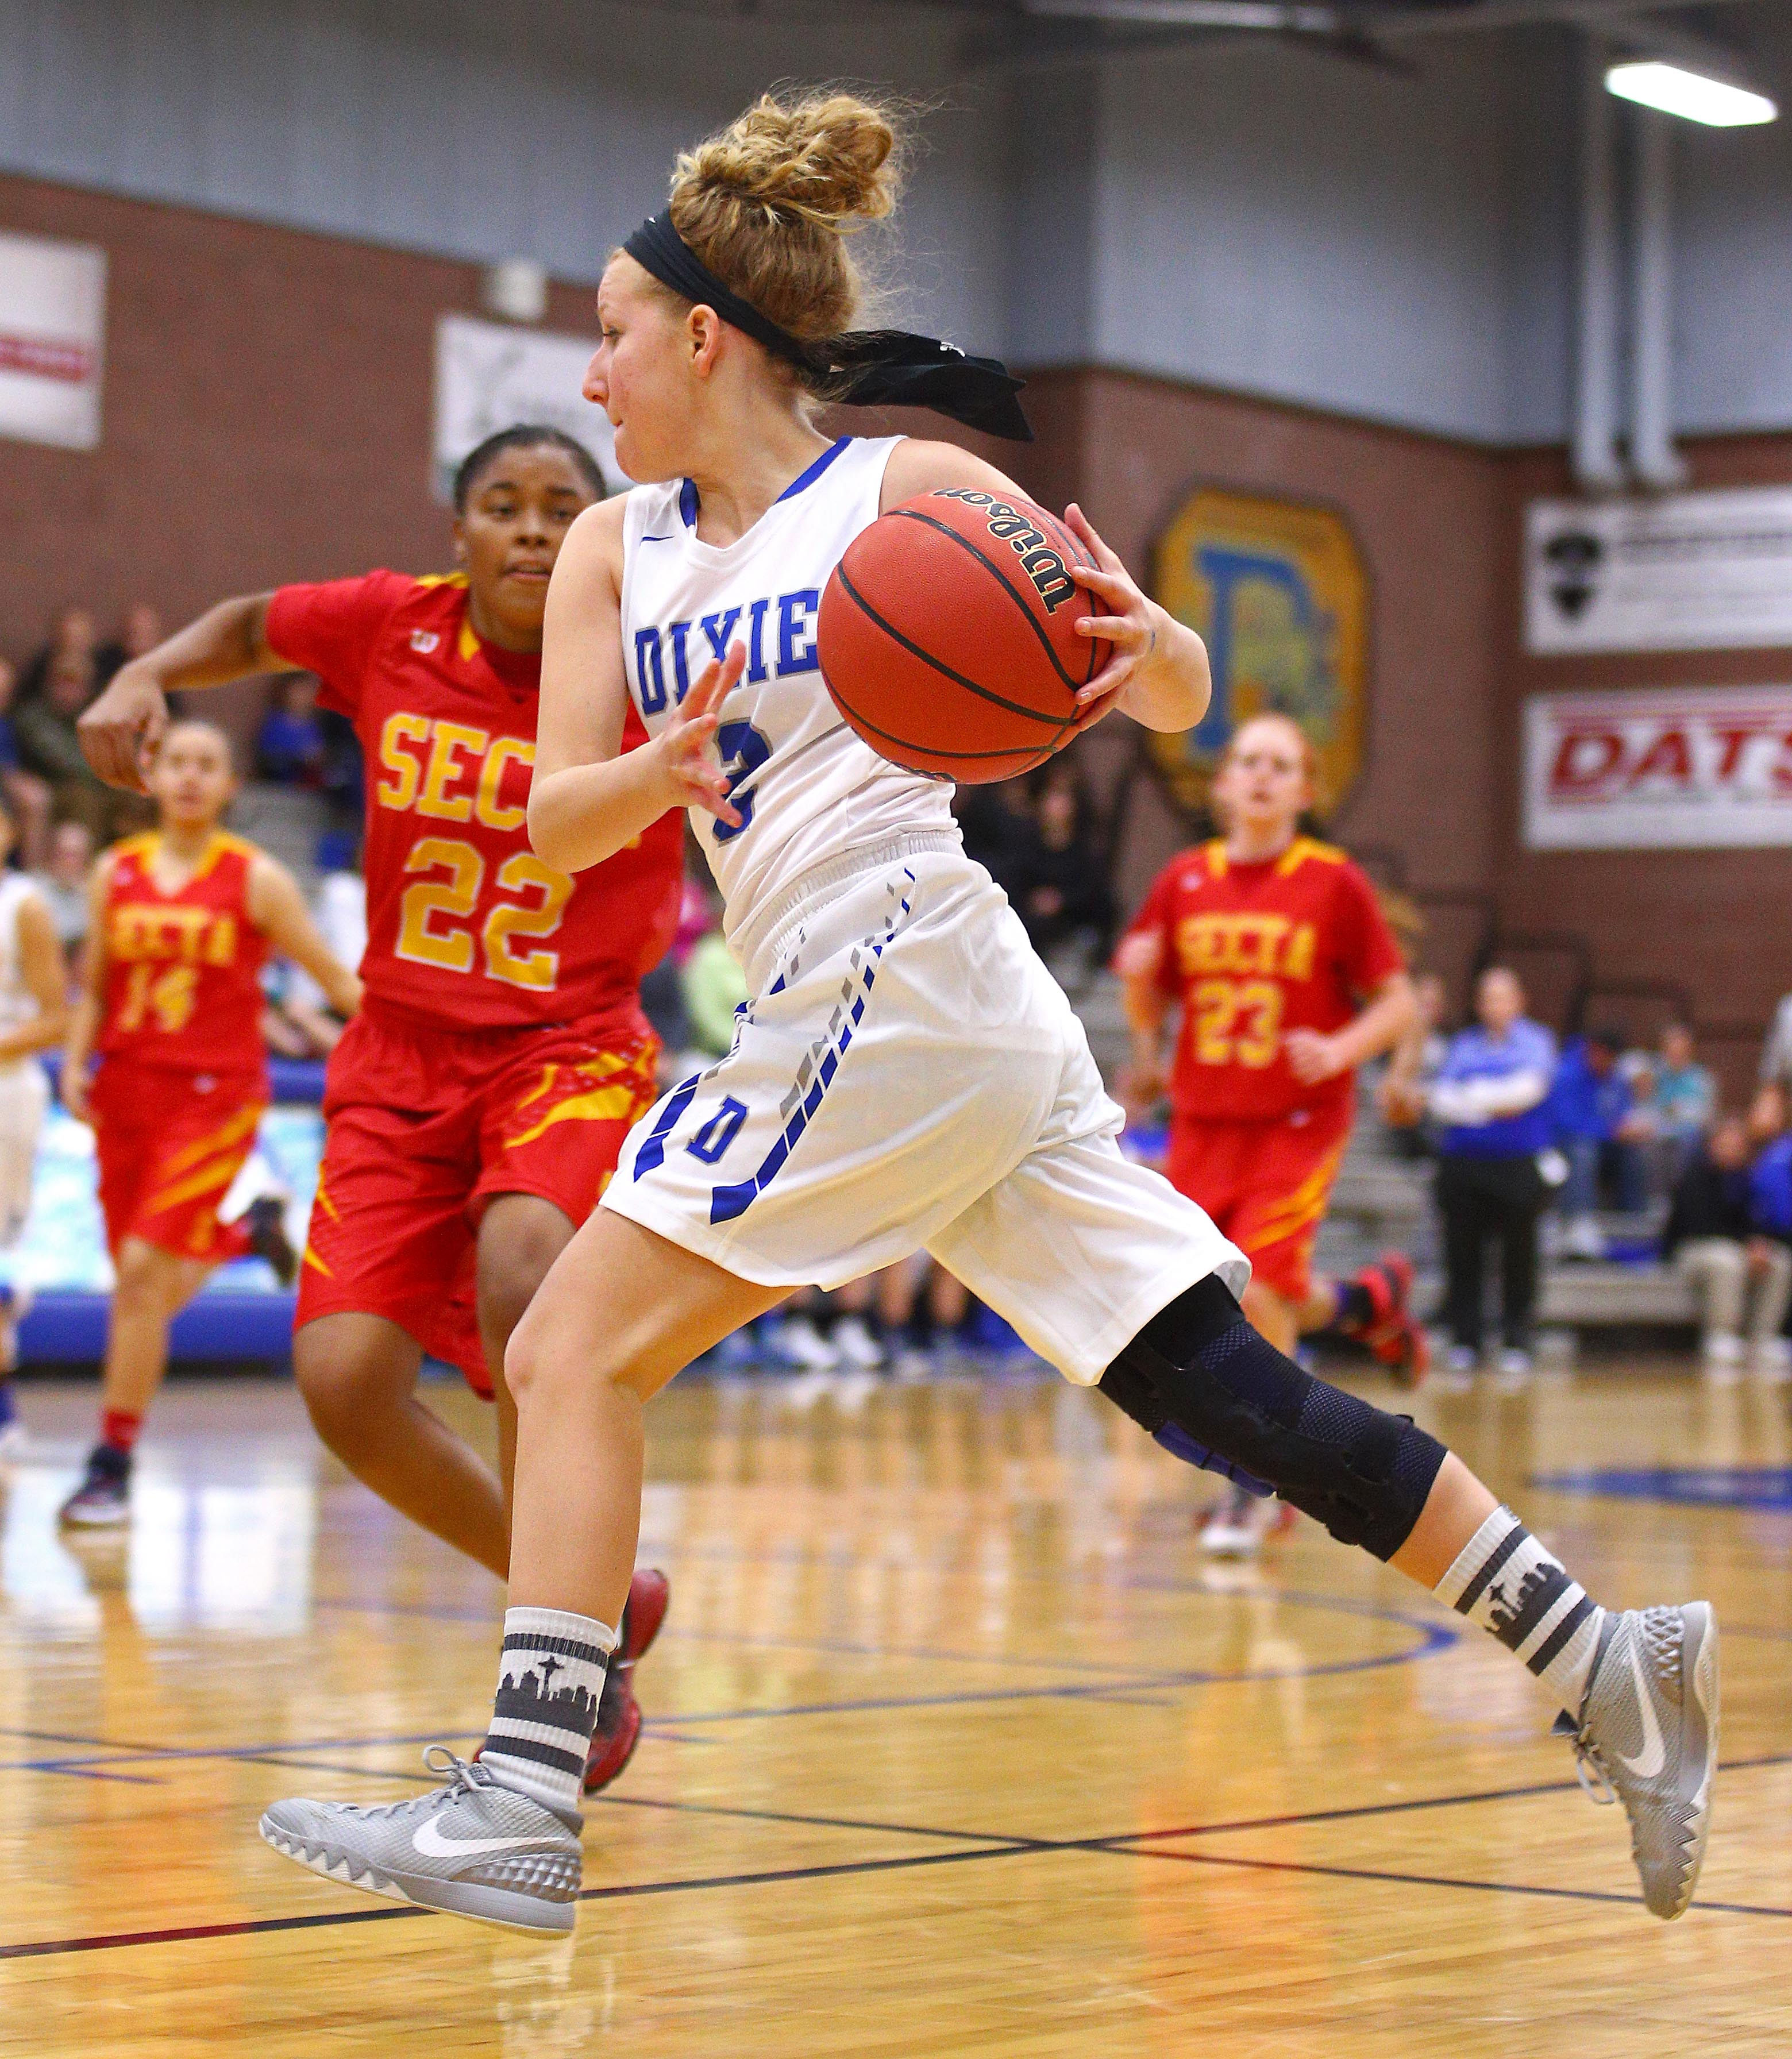 Dixie vs. Southeast Career Tech (NV), Girl's Basketball, St. George, Utah, Dec. 2, 2016, | Photo by Robert Hoppie, ASPpix.com, St. George News